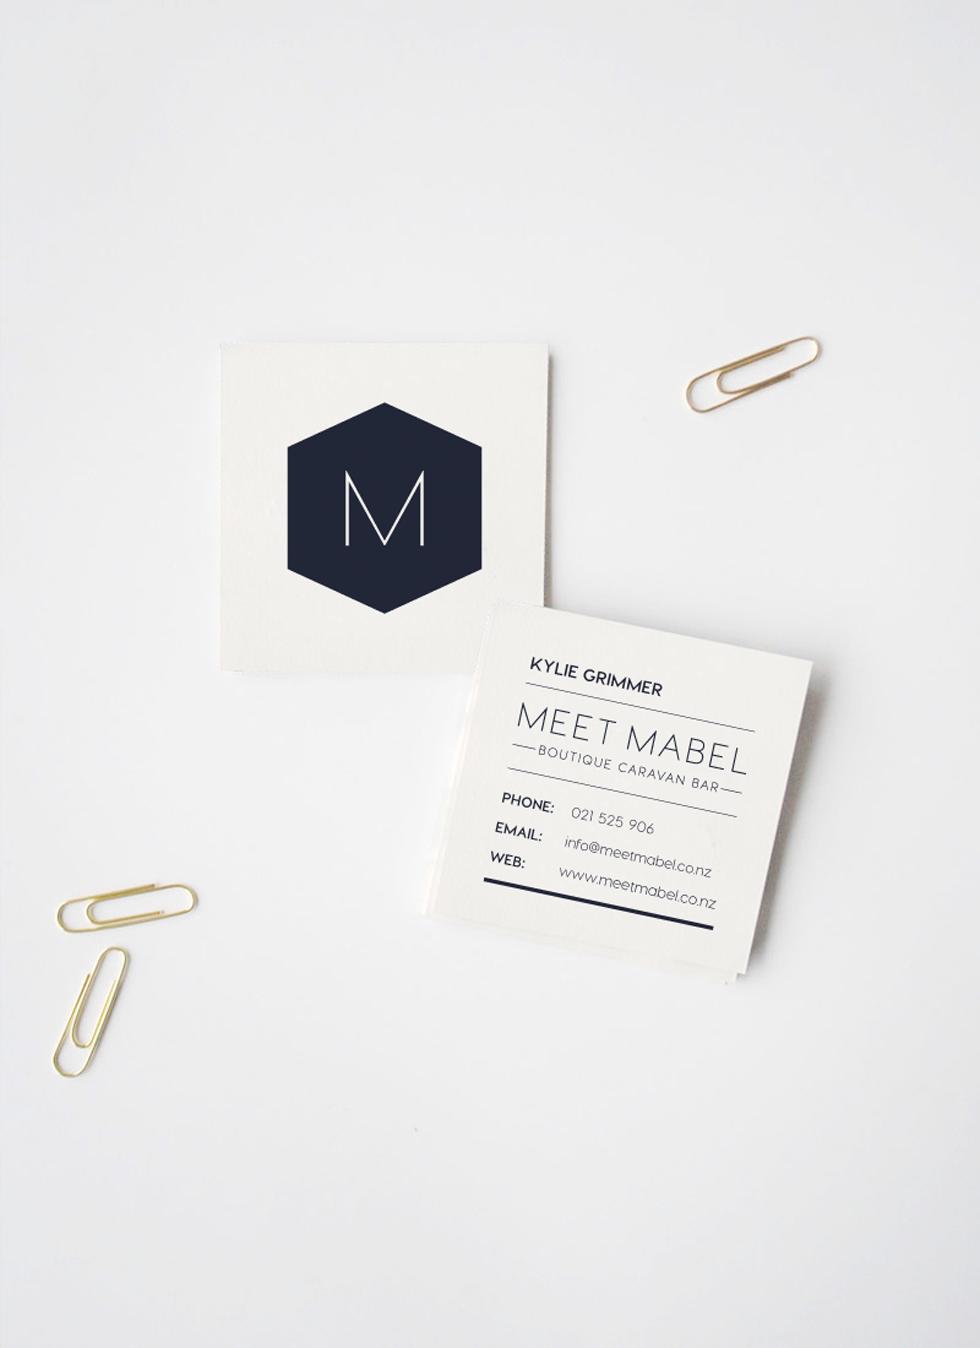 Meet-Mabel-Cards.png